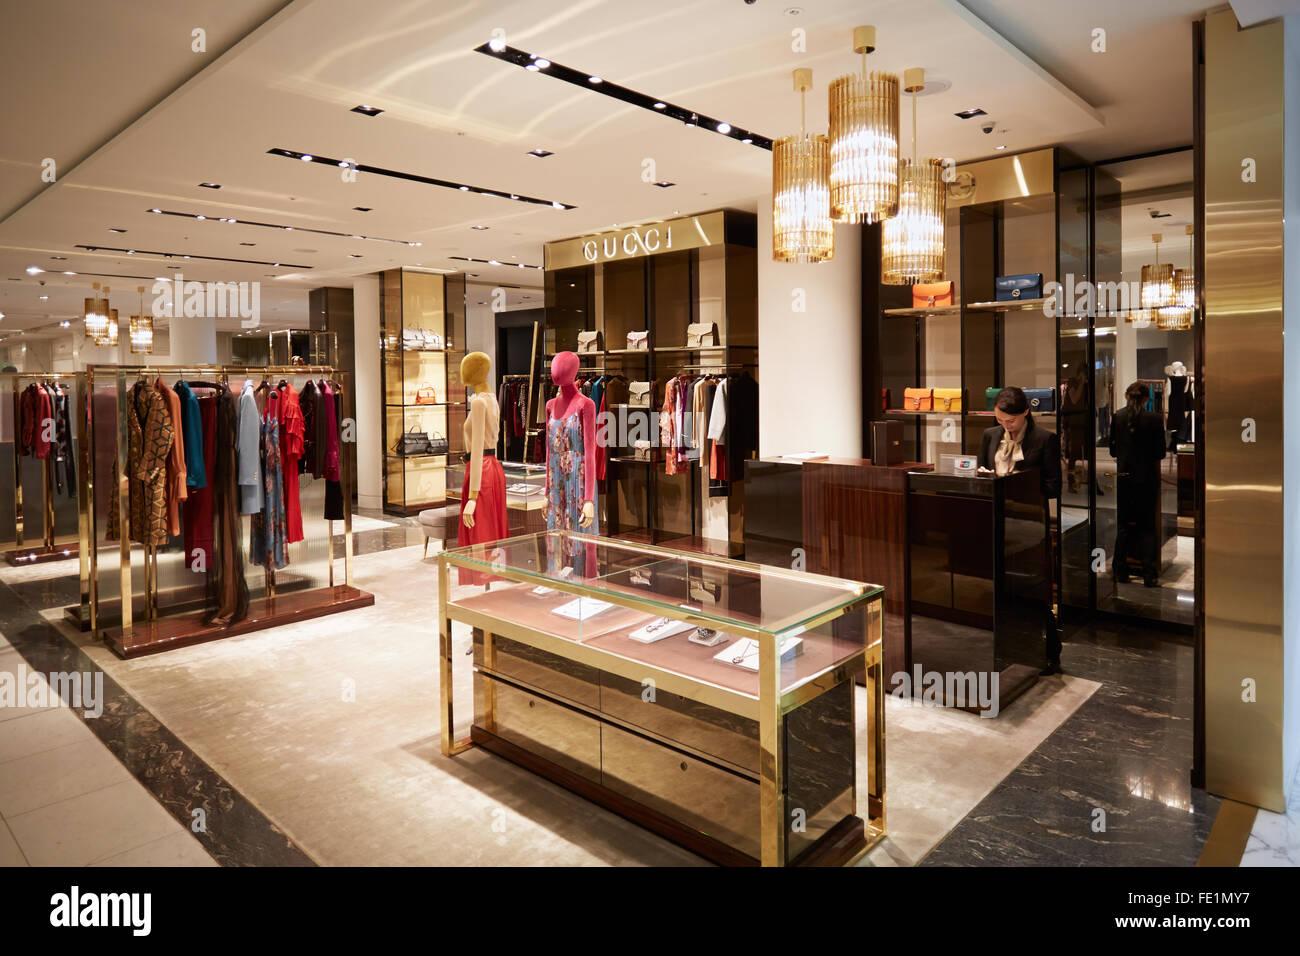 Selfridges department store interior, Gucci shop in London - Stock Image a1a3949b85e